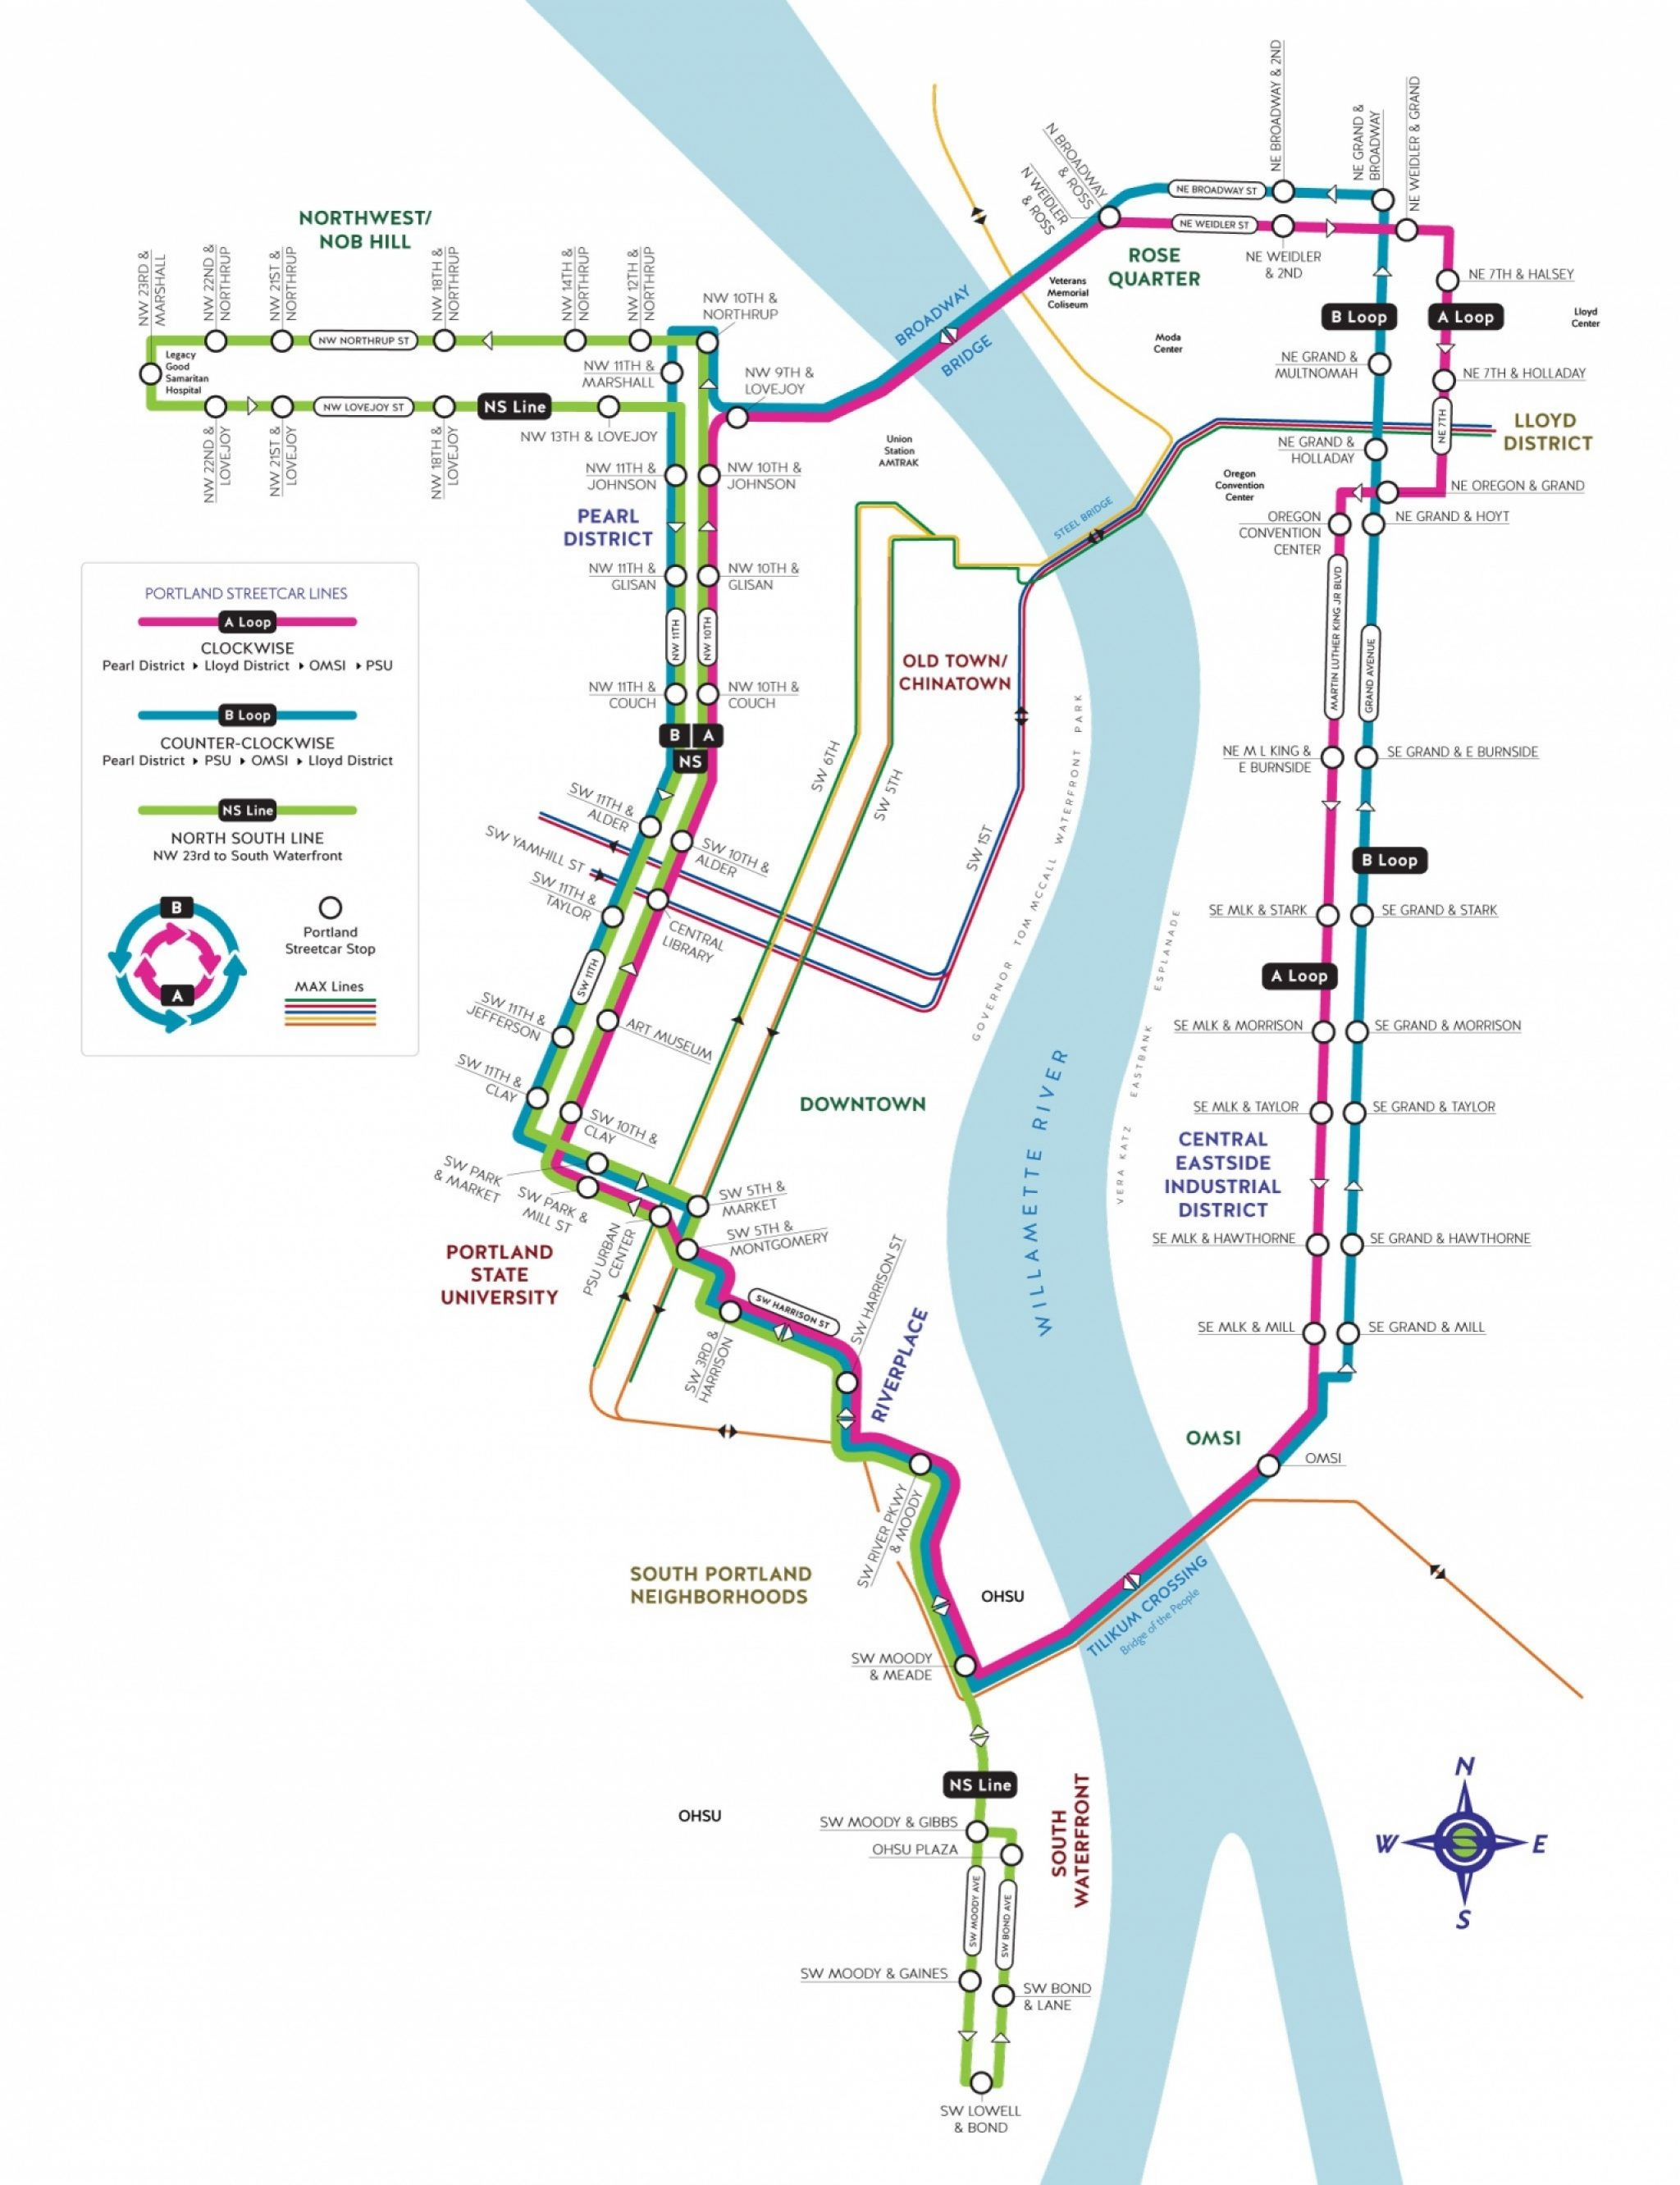 photograph regarding Loop Schedule Printable called Maps + Schedules - Portland Streetcar